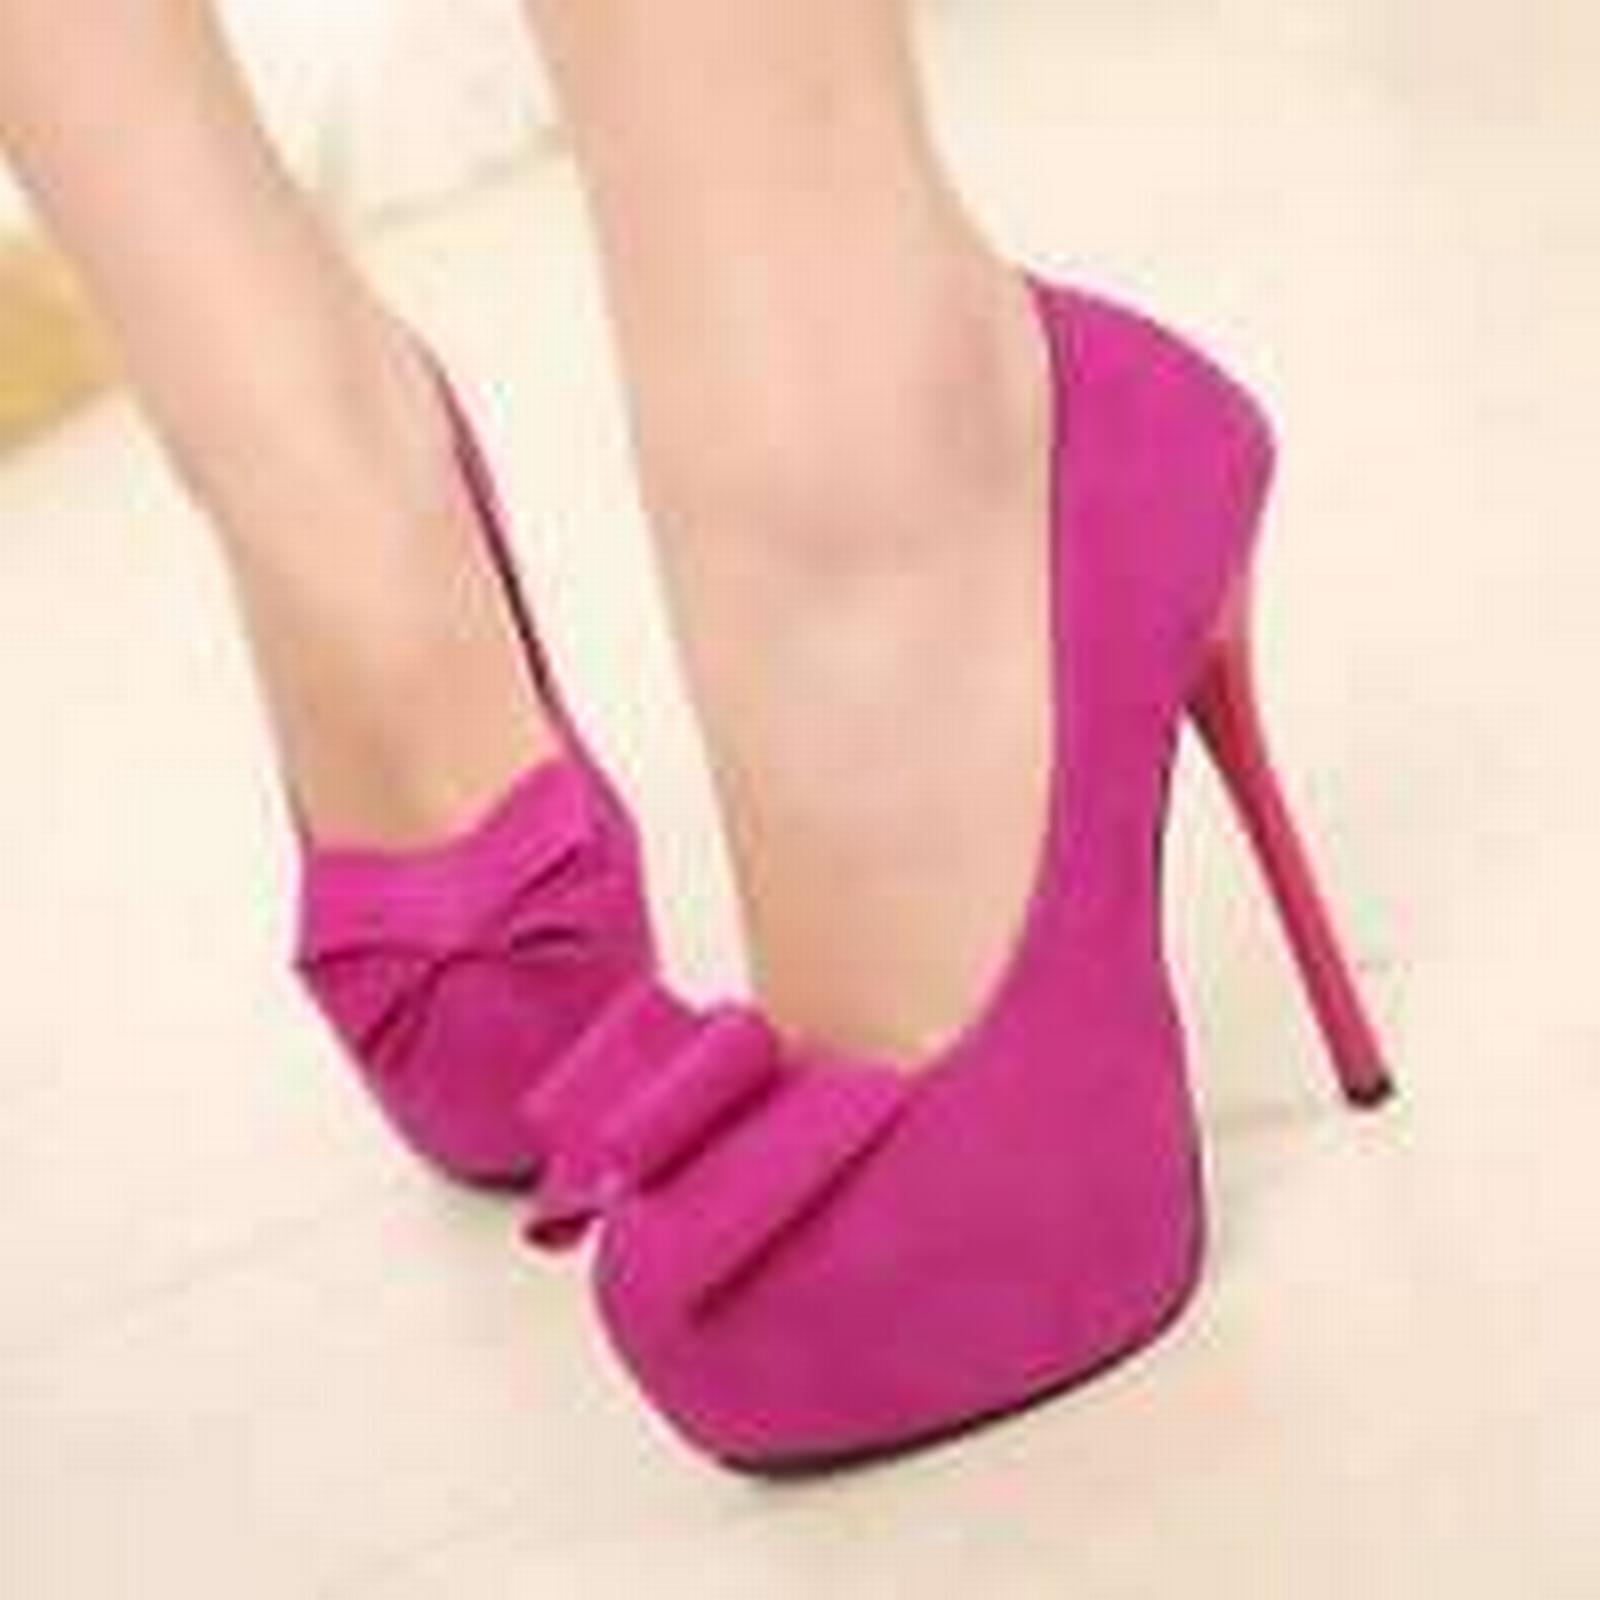 Bonanza front, (Global) pp272 Stunning high heel pump w bowtie front, Bonanza US Size 5-8.5, red b47962